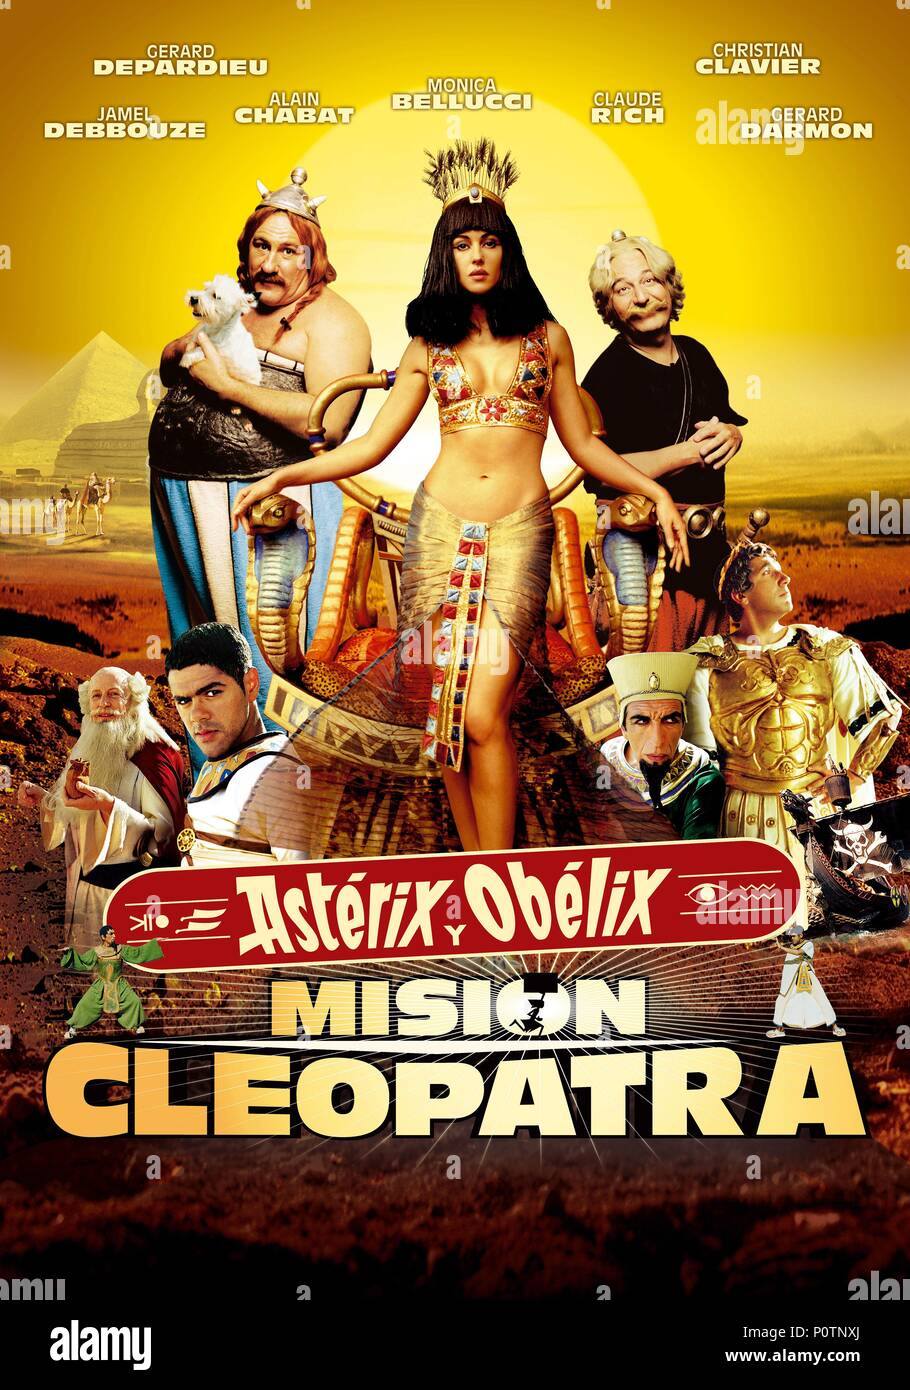 asterix mission cleopatre dvdrip